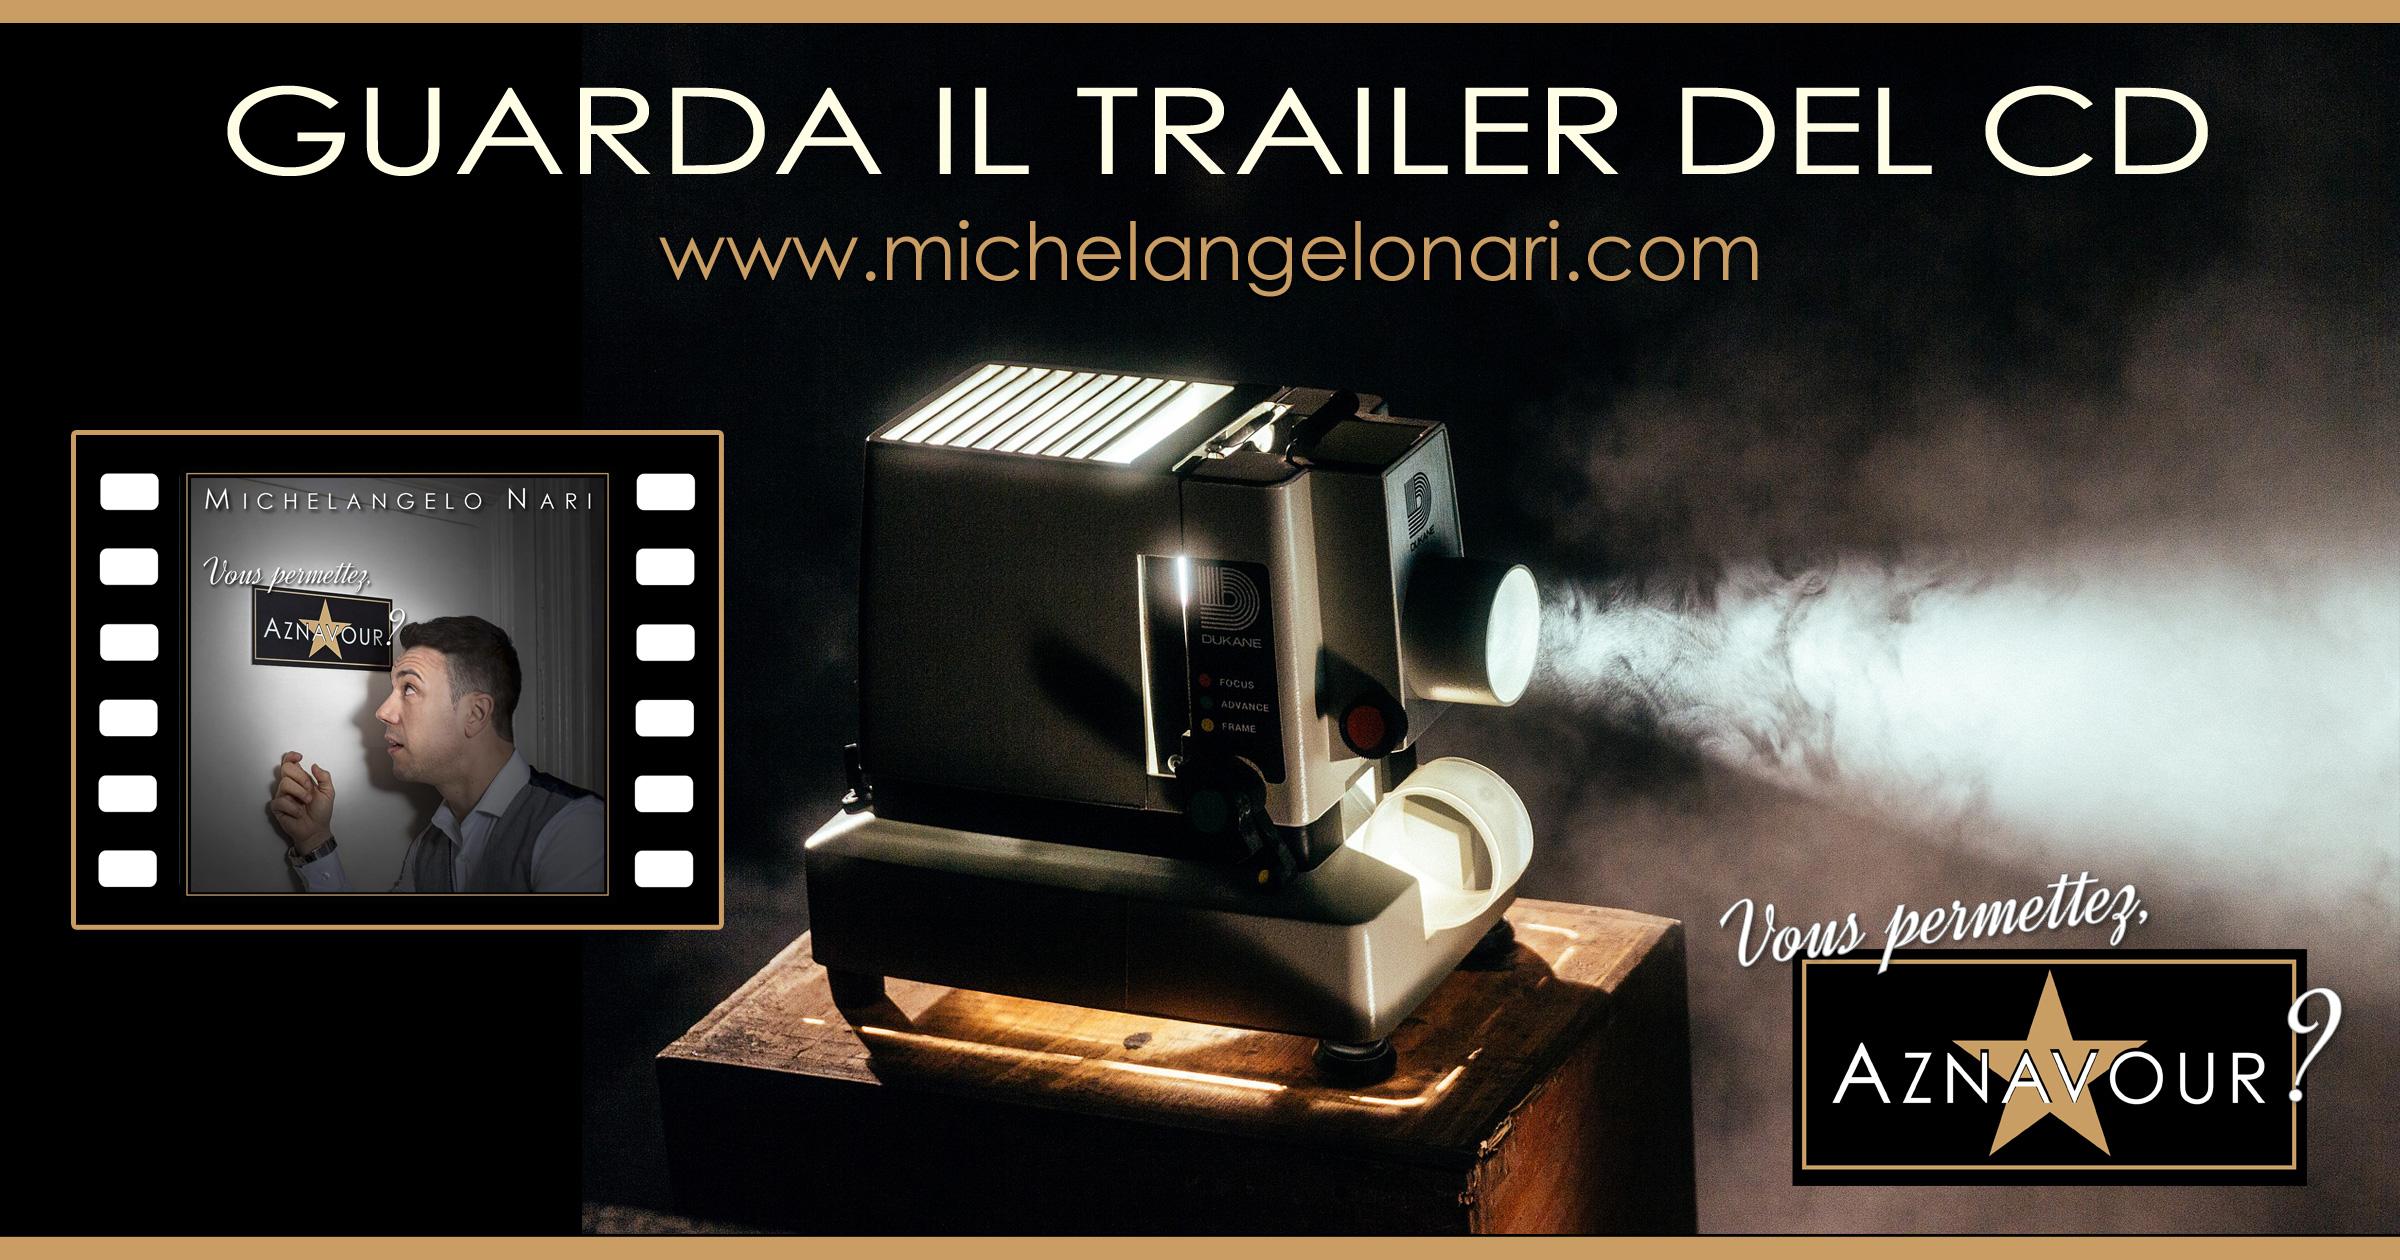 "Michelangelo Nari - ""Vous permettez, Aznavour?"" - Guarda il trailer del CD"